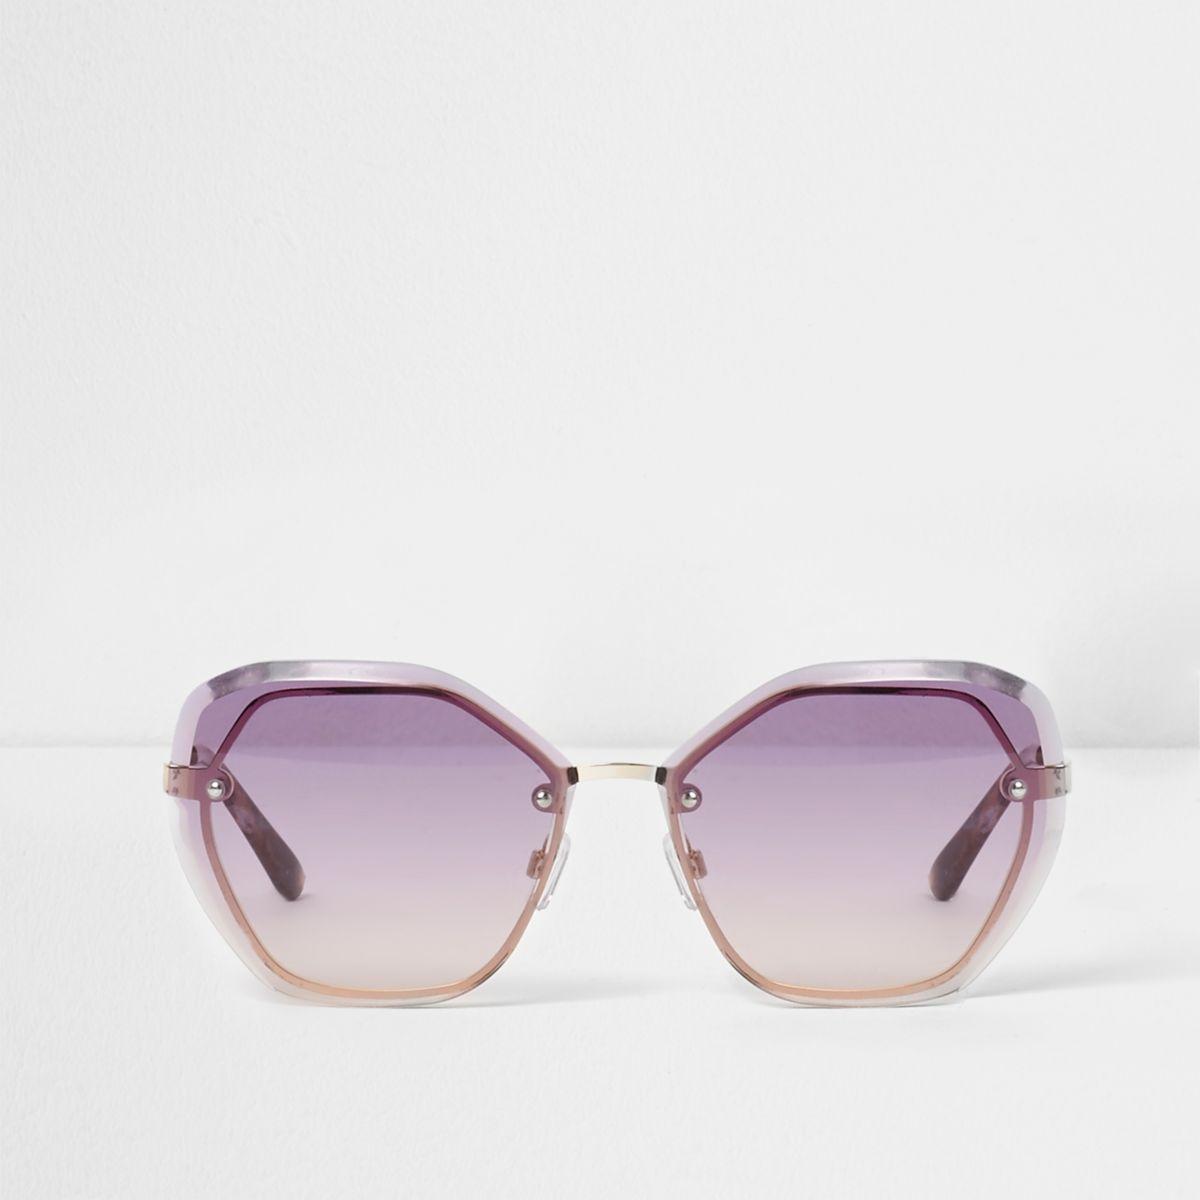 Lilac glam hexagon ocean sunglasses